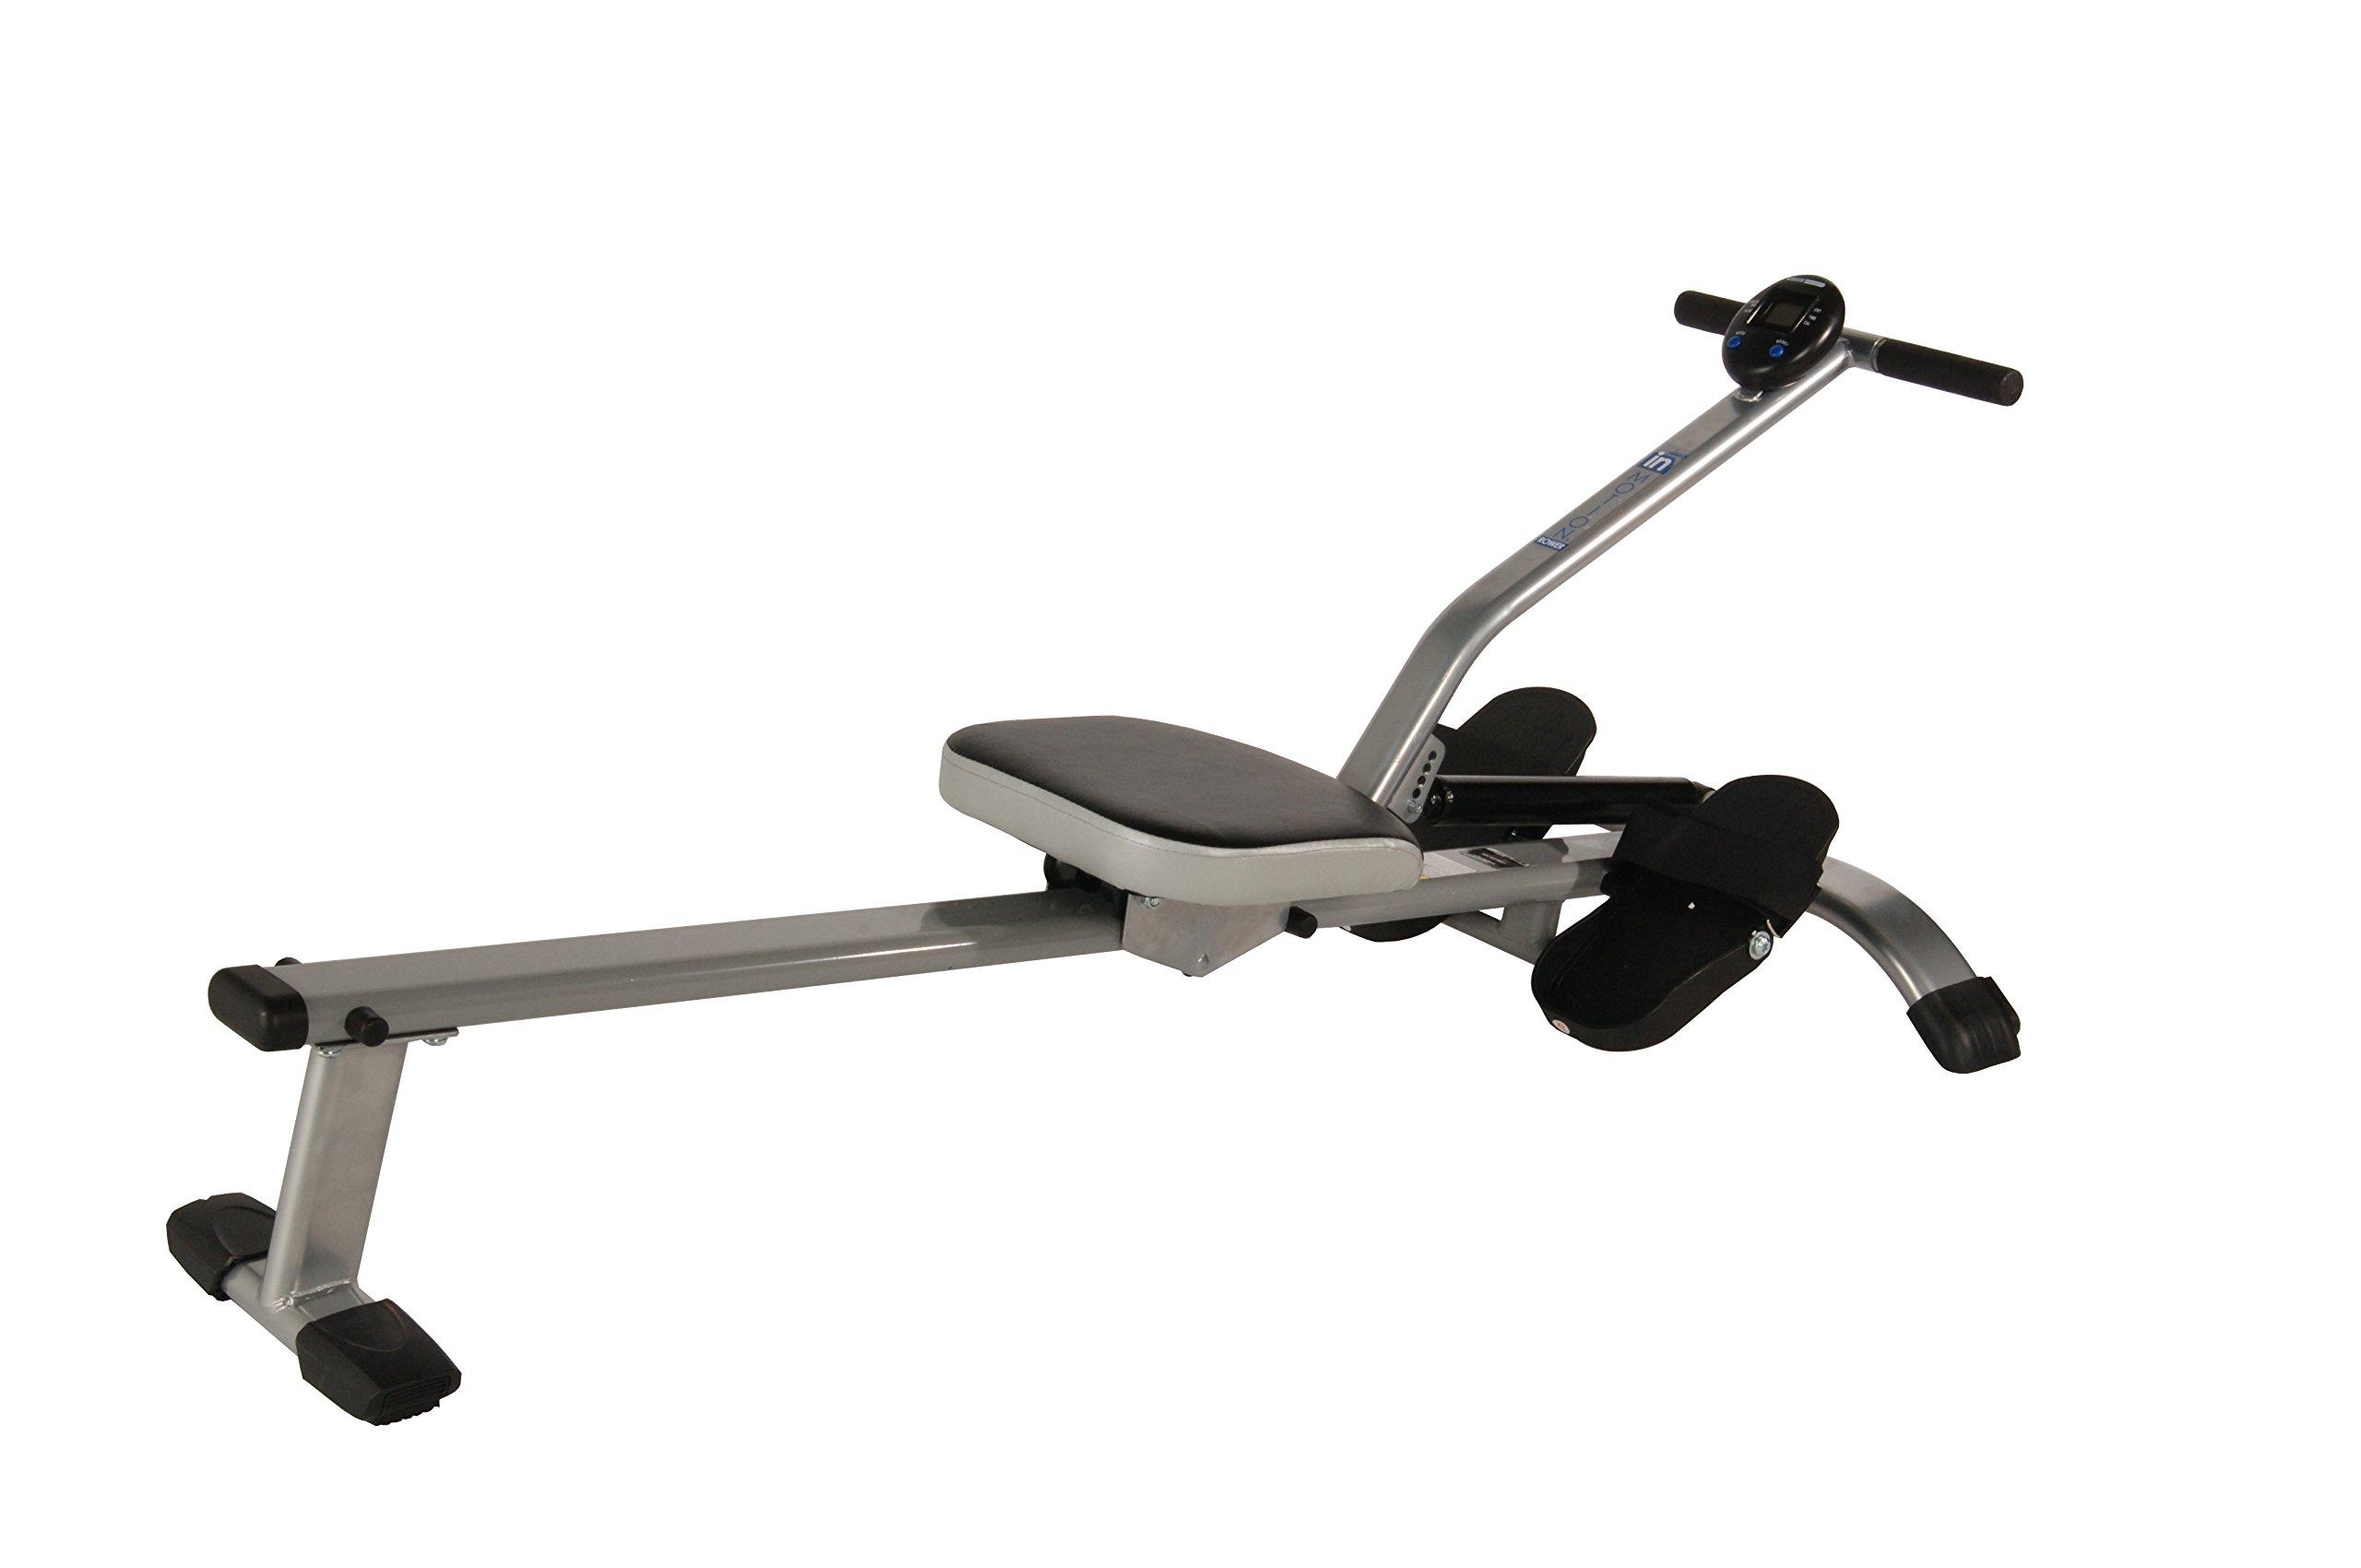 Stamina 35-0123 Inmotion Rower, Silver